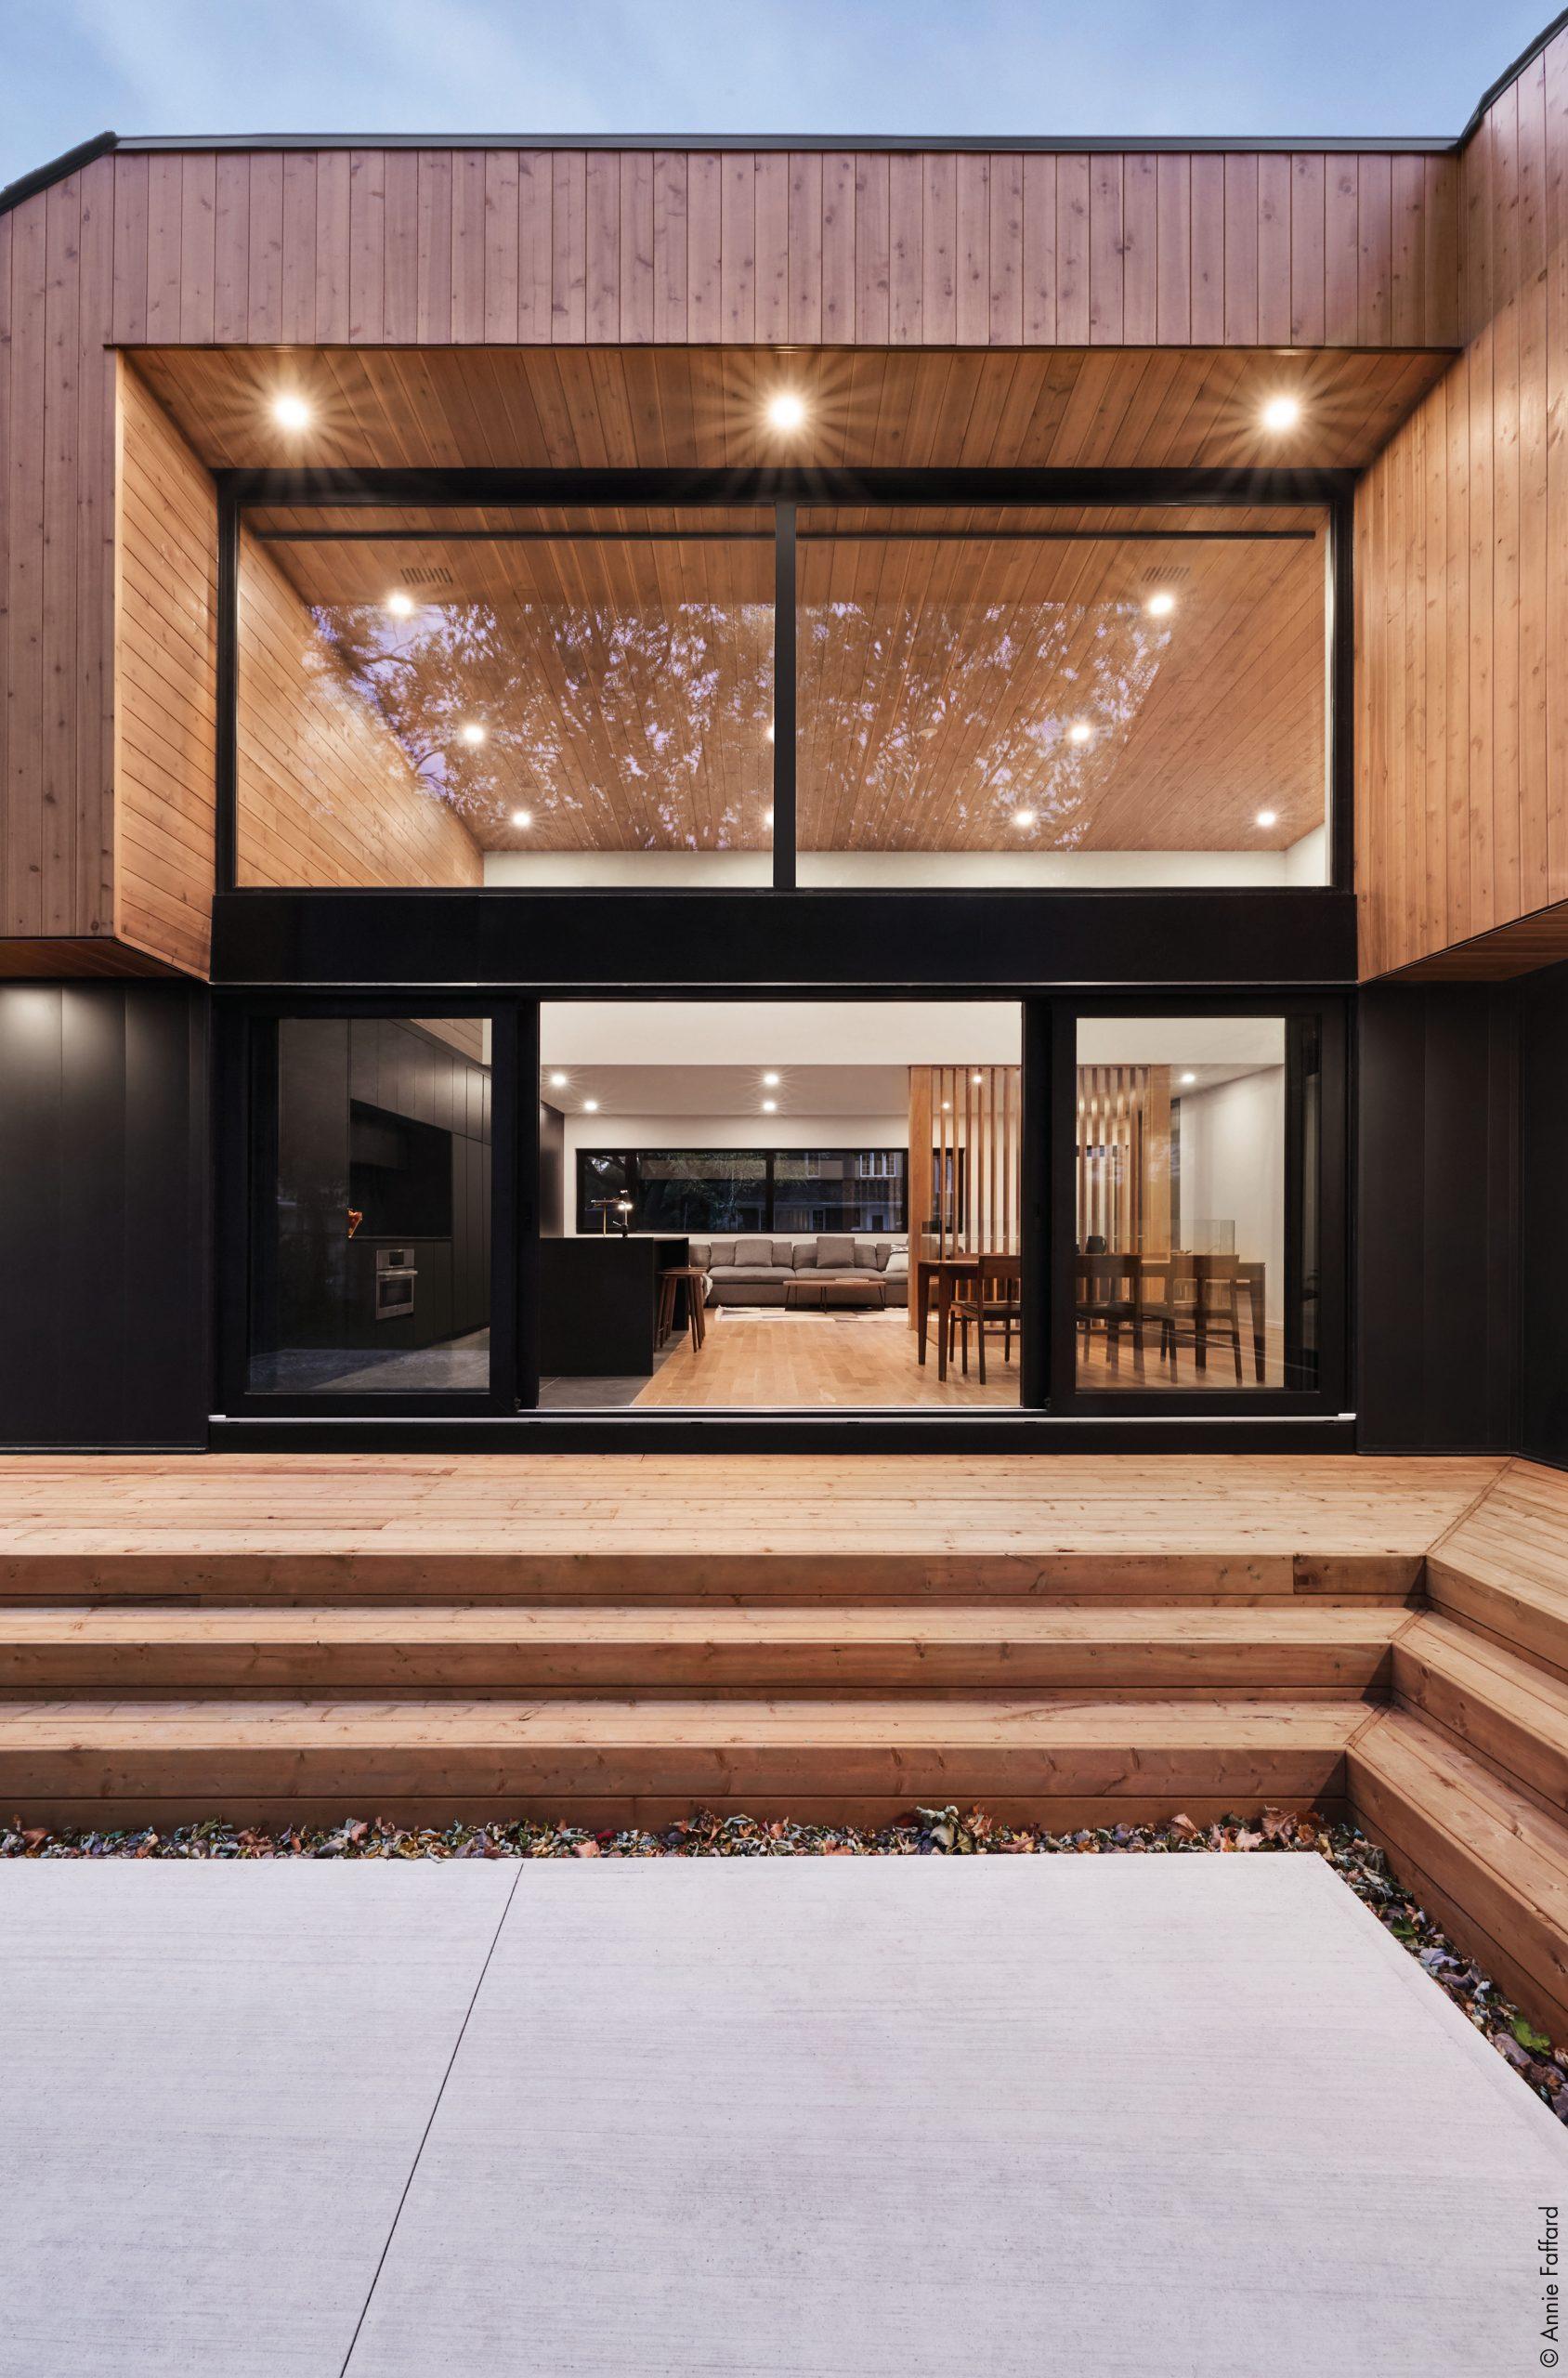 Pearl House Montréal, Canada : MXMA Architecture & Design